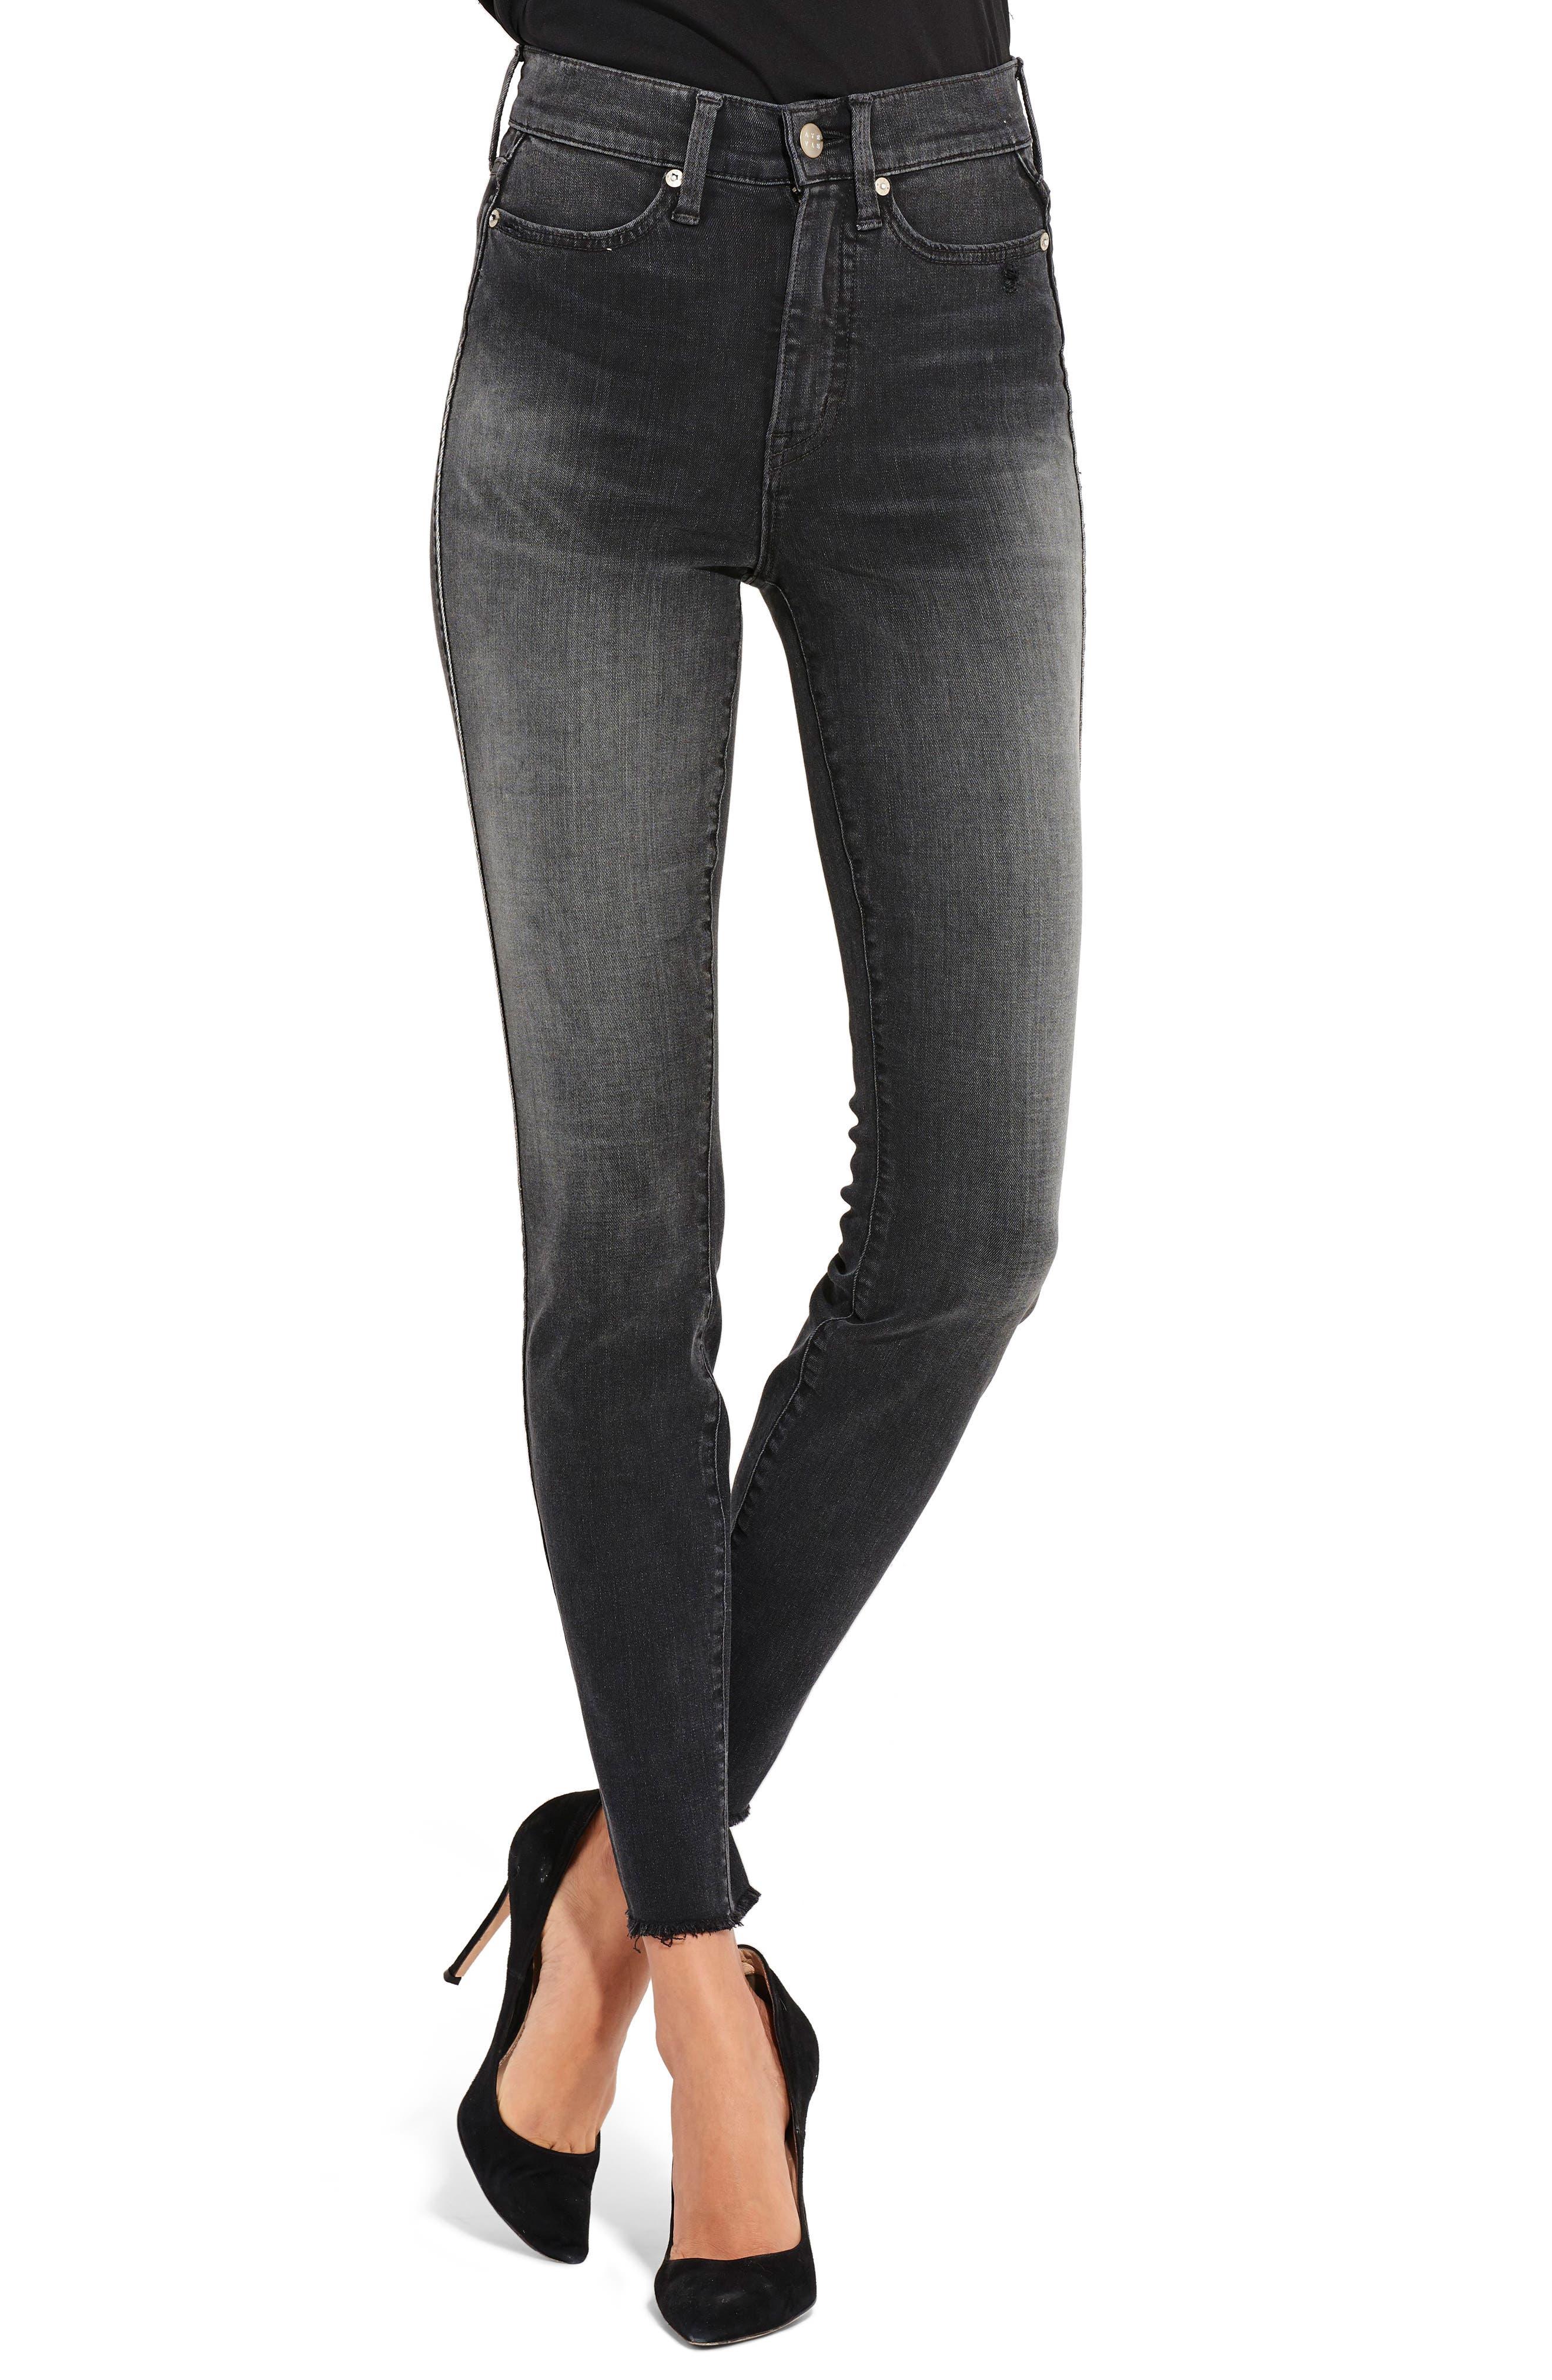 Main Image - AYR The Riser Skinny Jeans (Strobe)